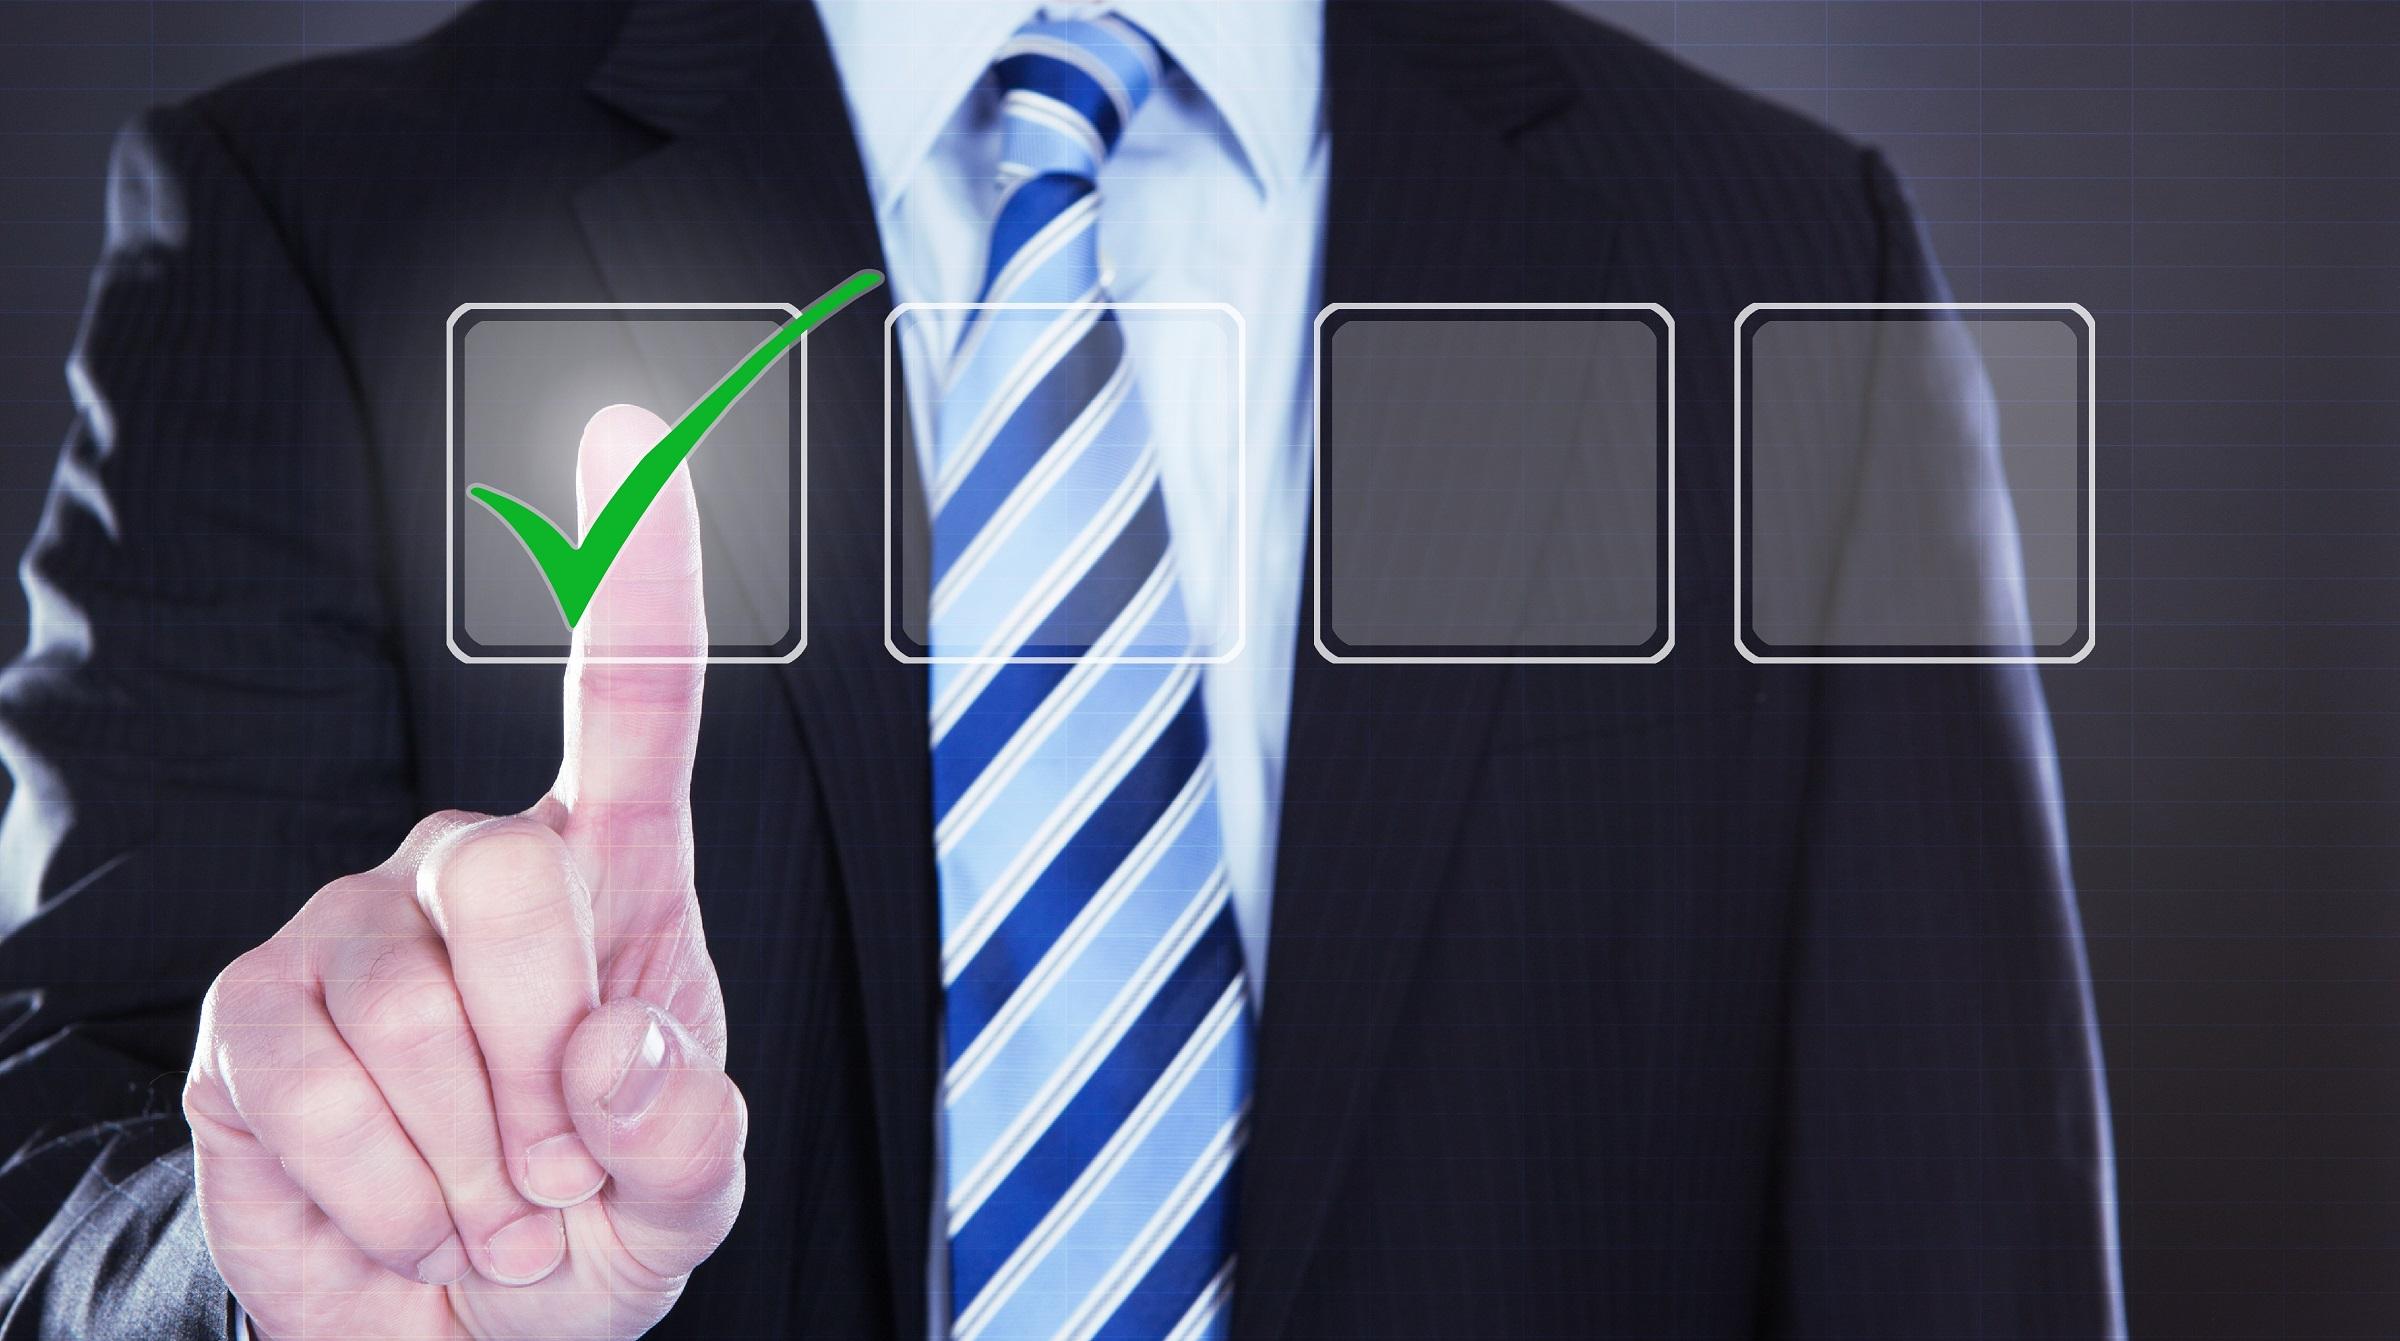 Affärsman kryssar i checklista